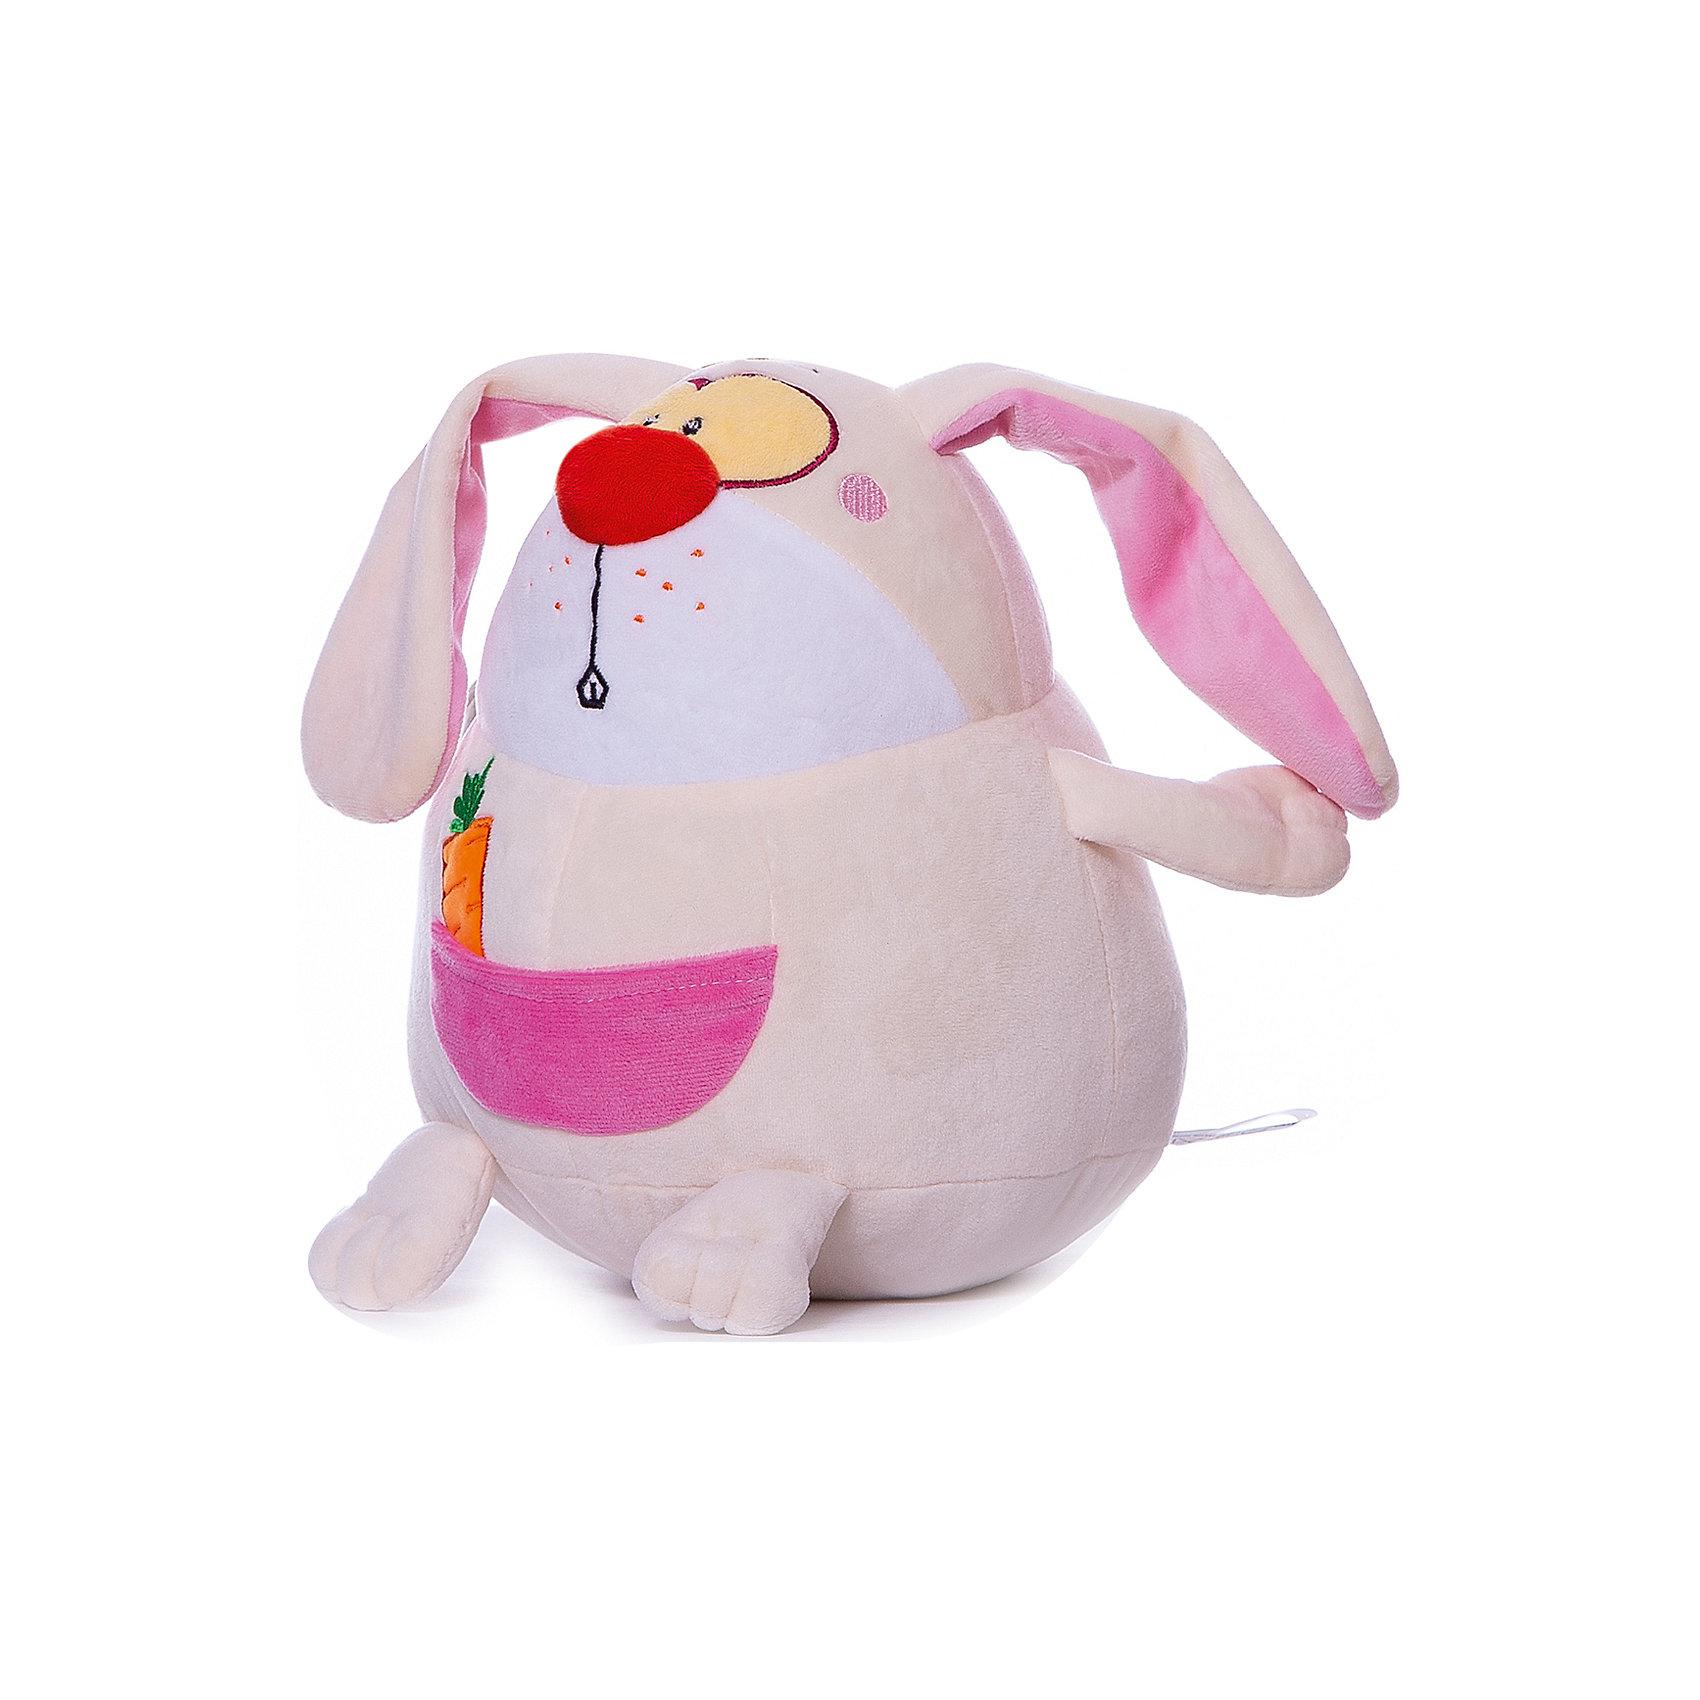 Игрушка Заяц-шарик, Small Toys, молочный